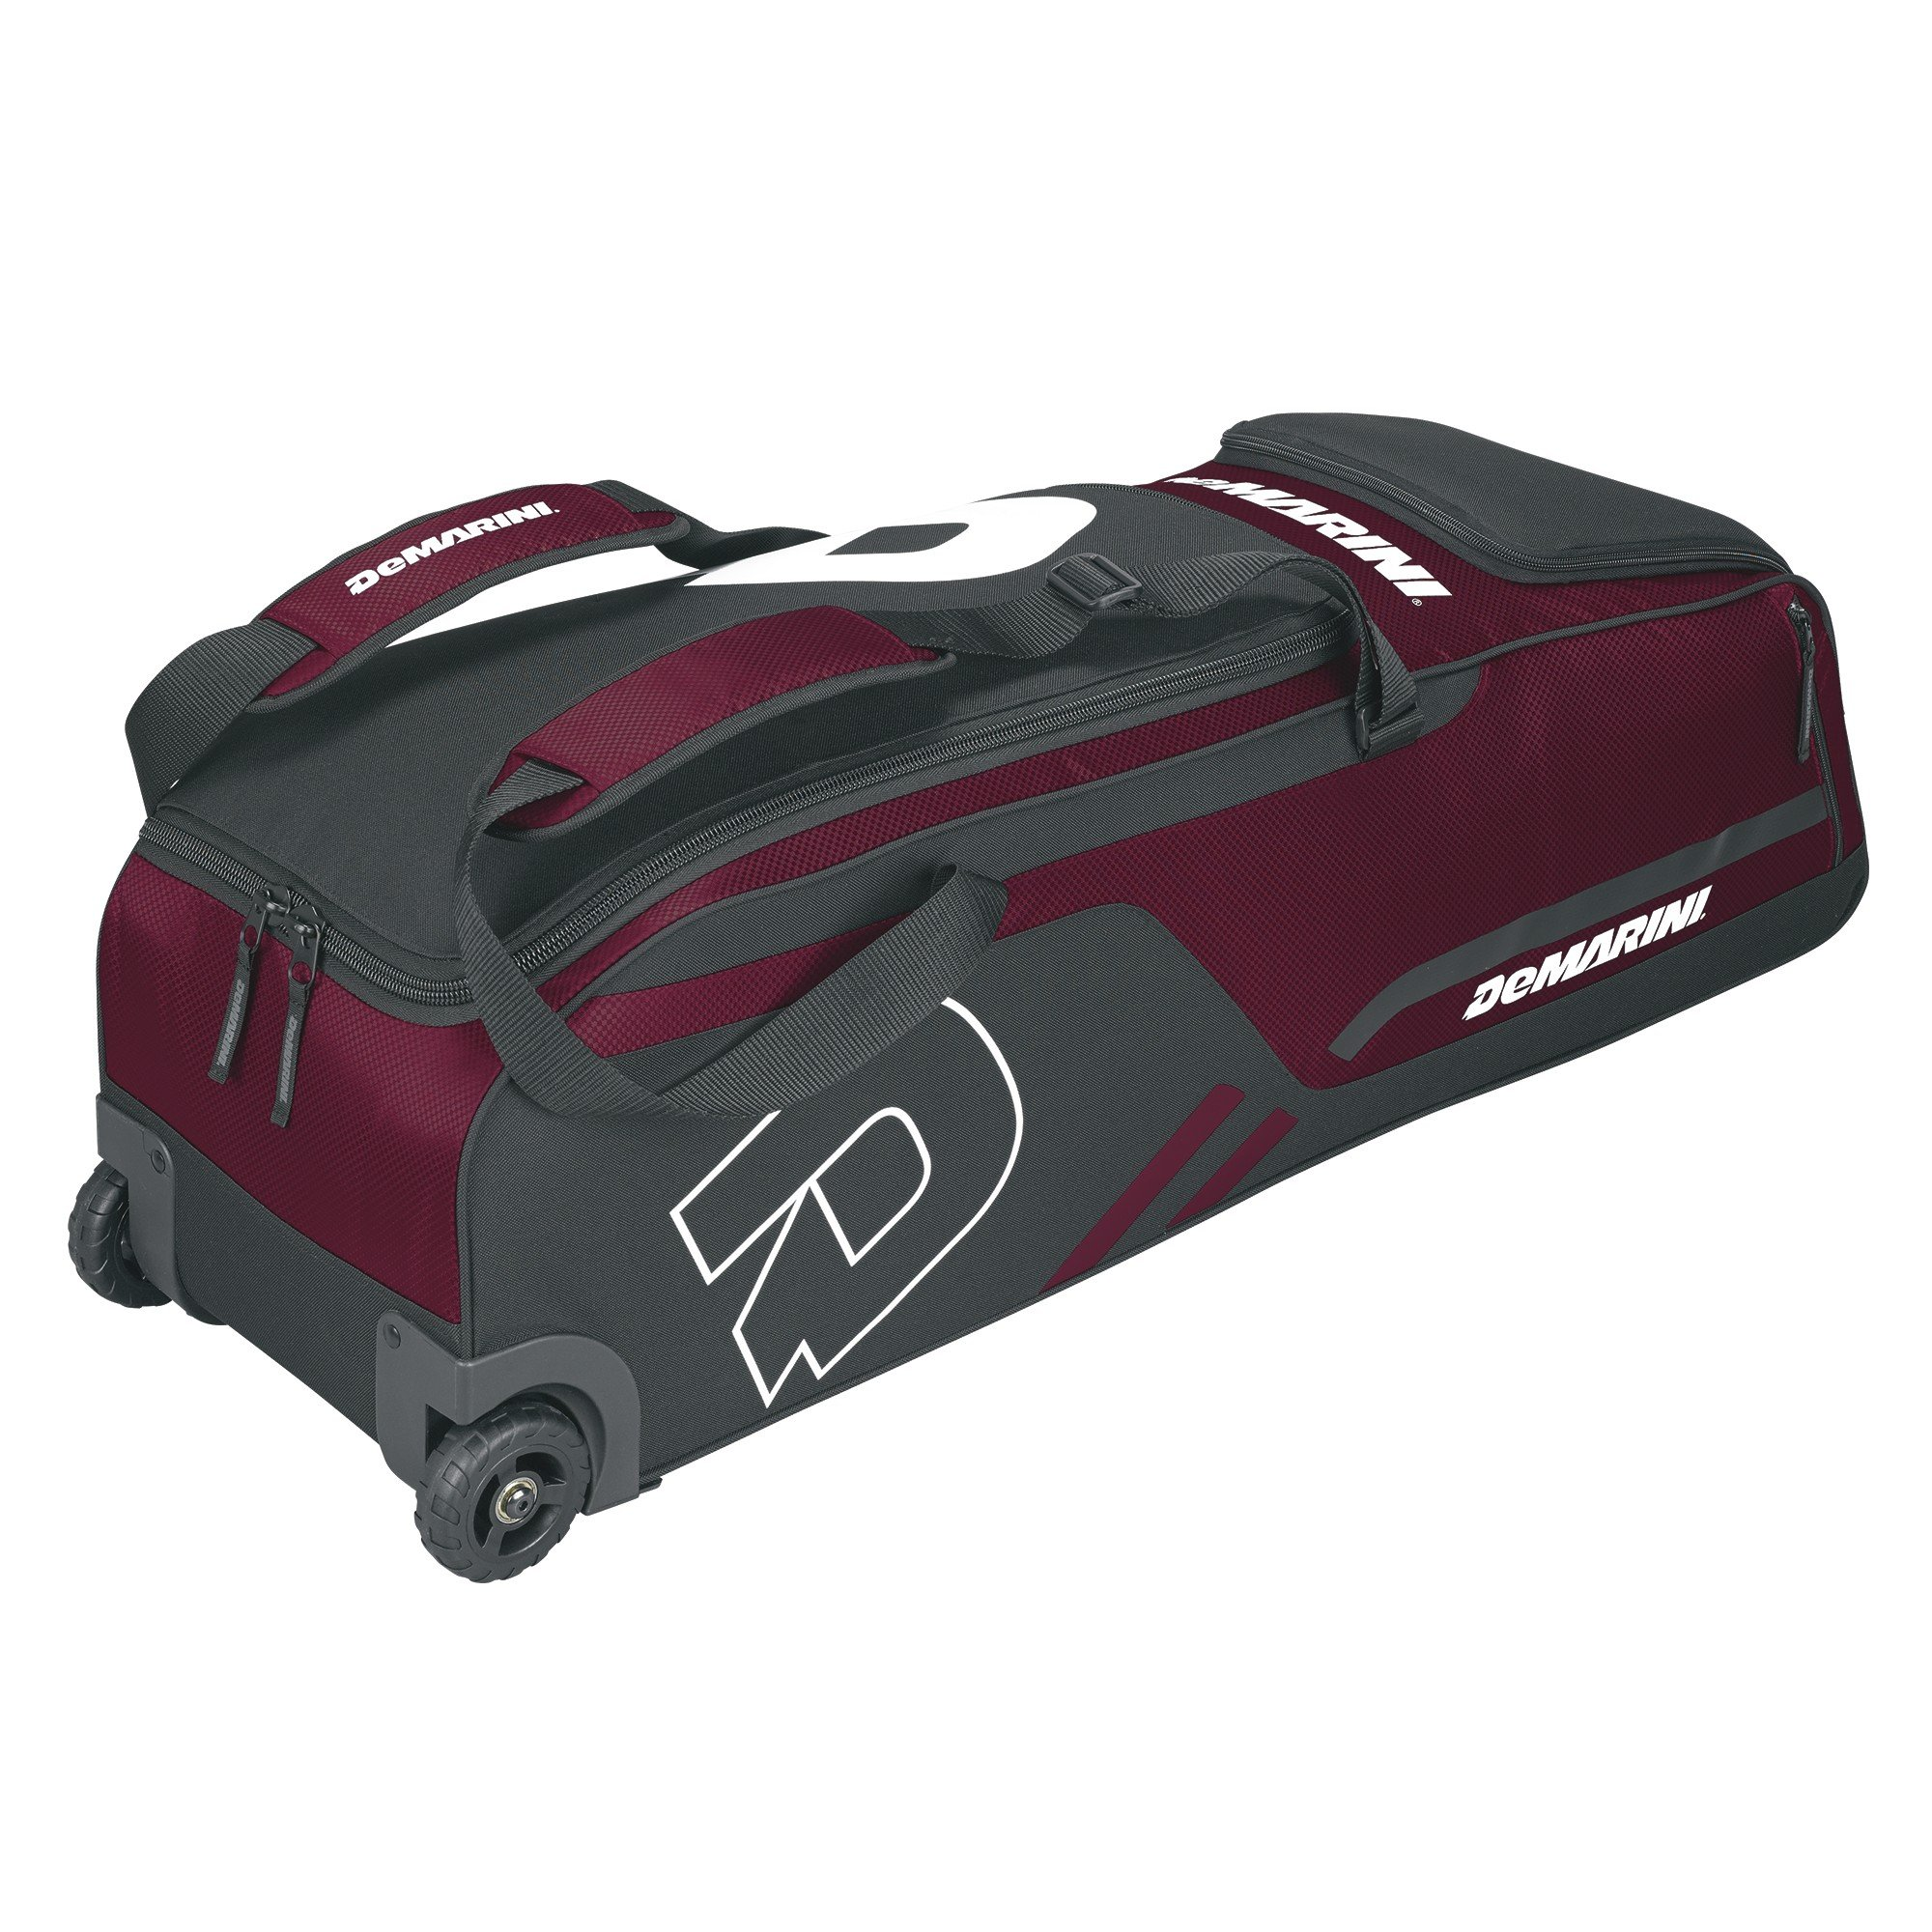 DeMarini Momentum Wheeled Bag, Maroon by DeMarini